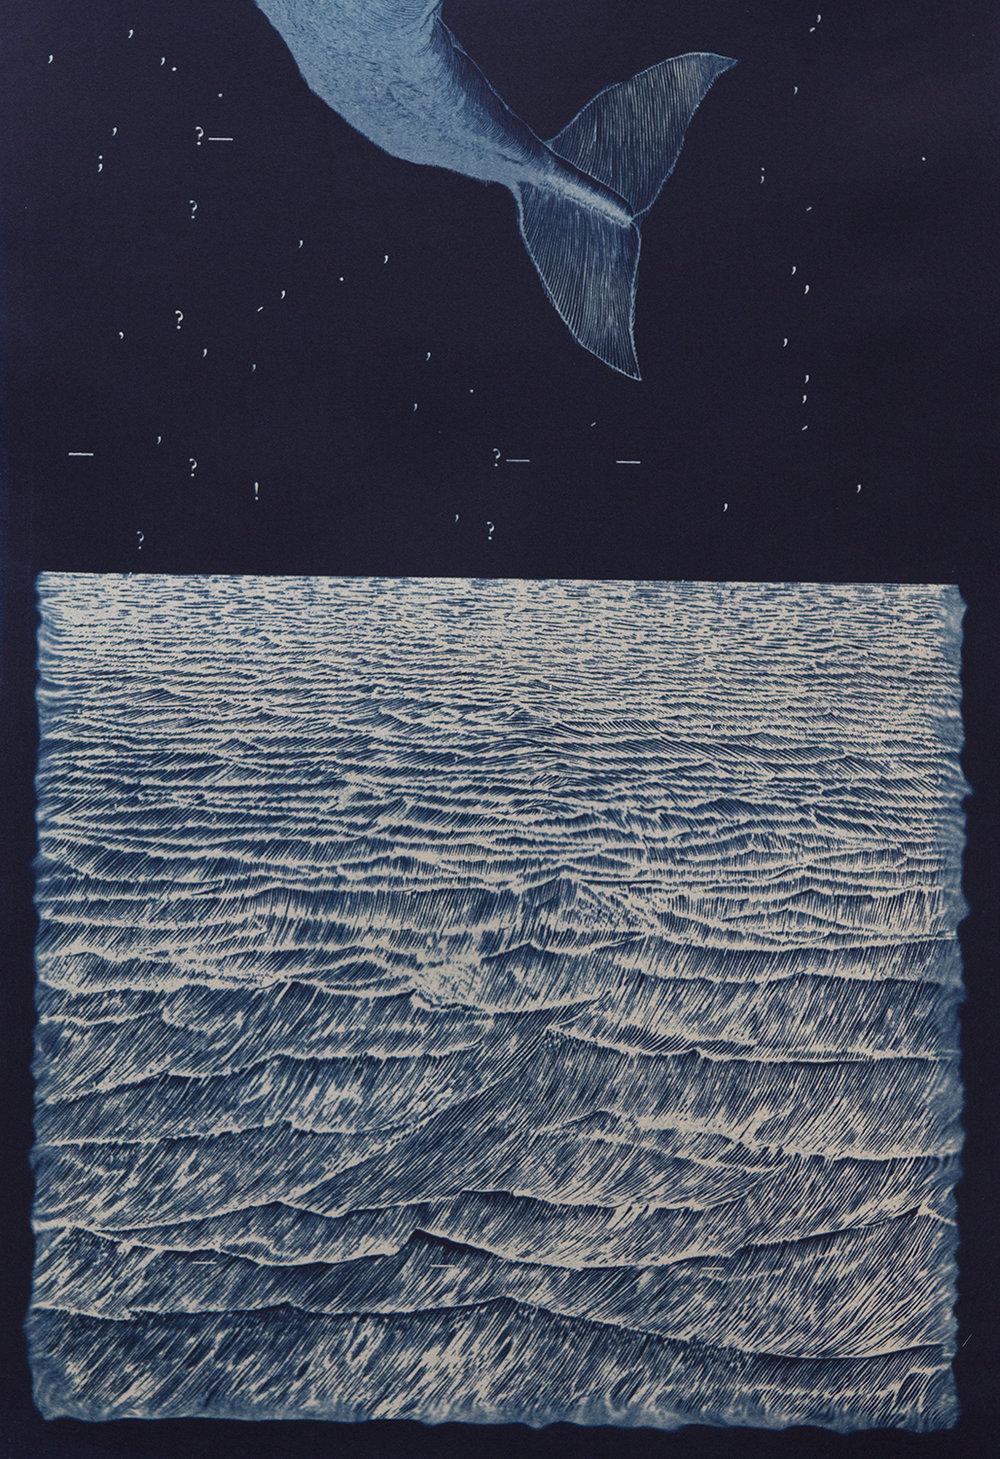 Seguin_Tails-Away_2011_cyanotype_22x15